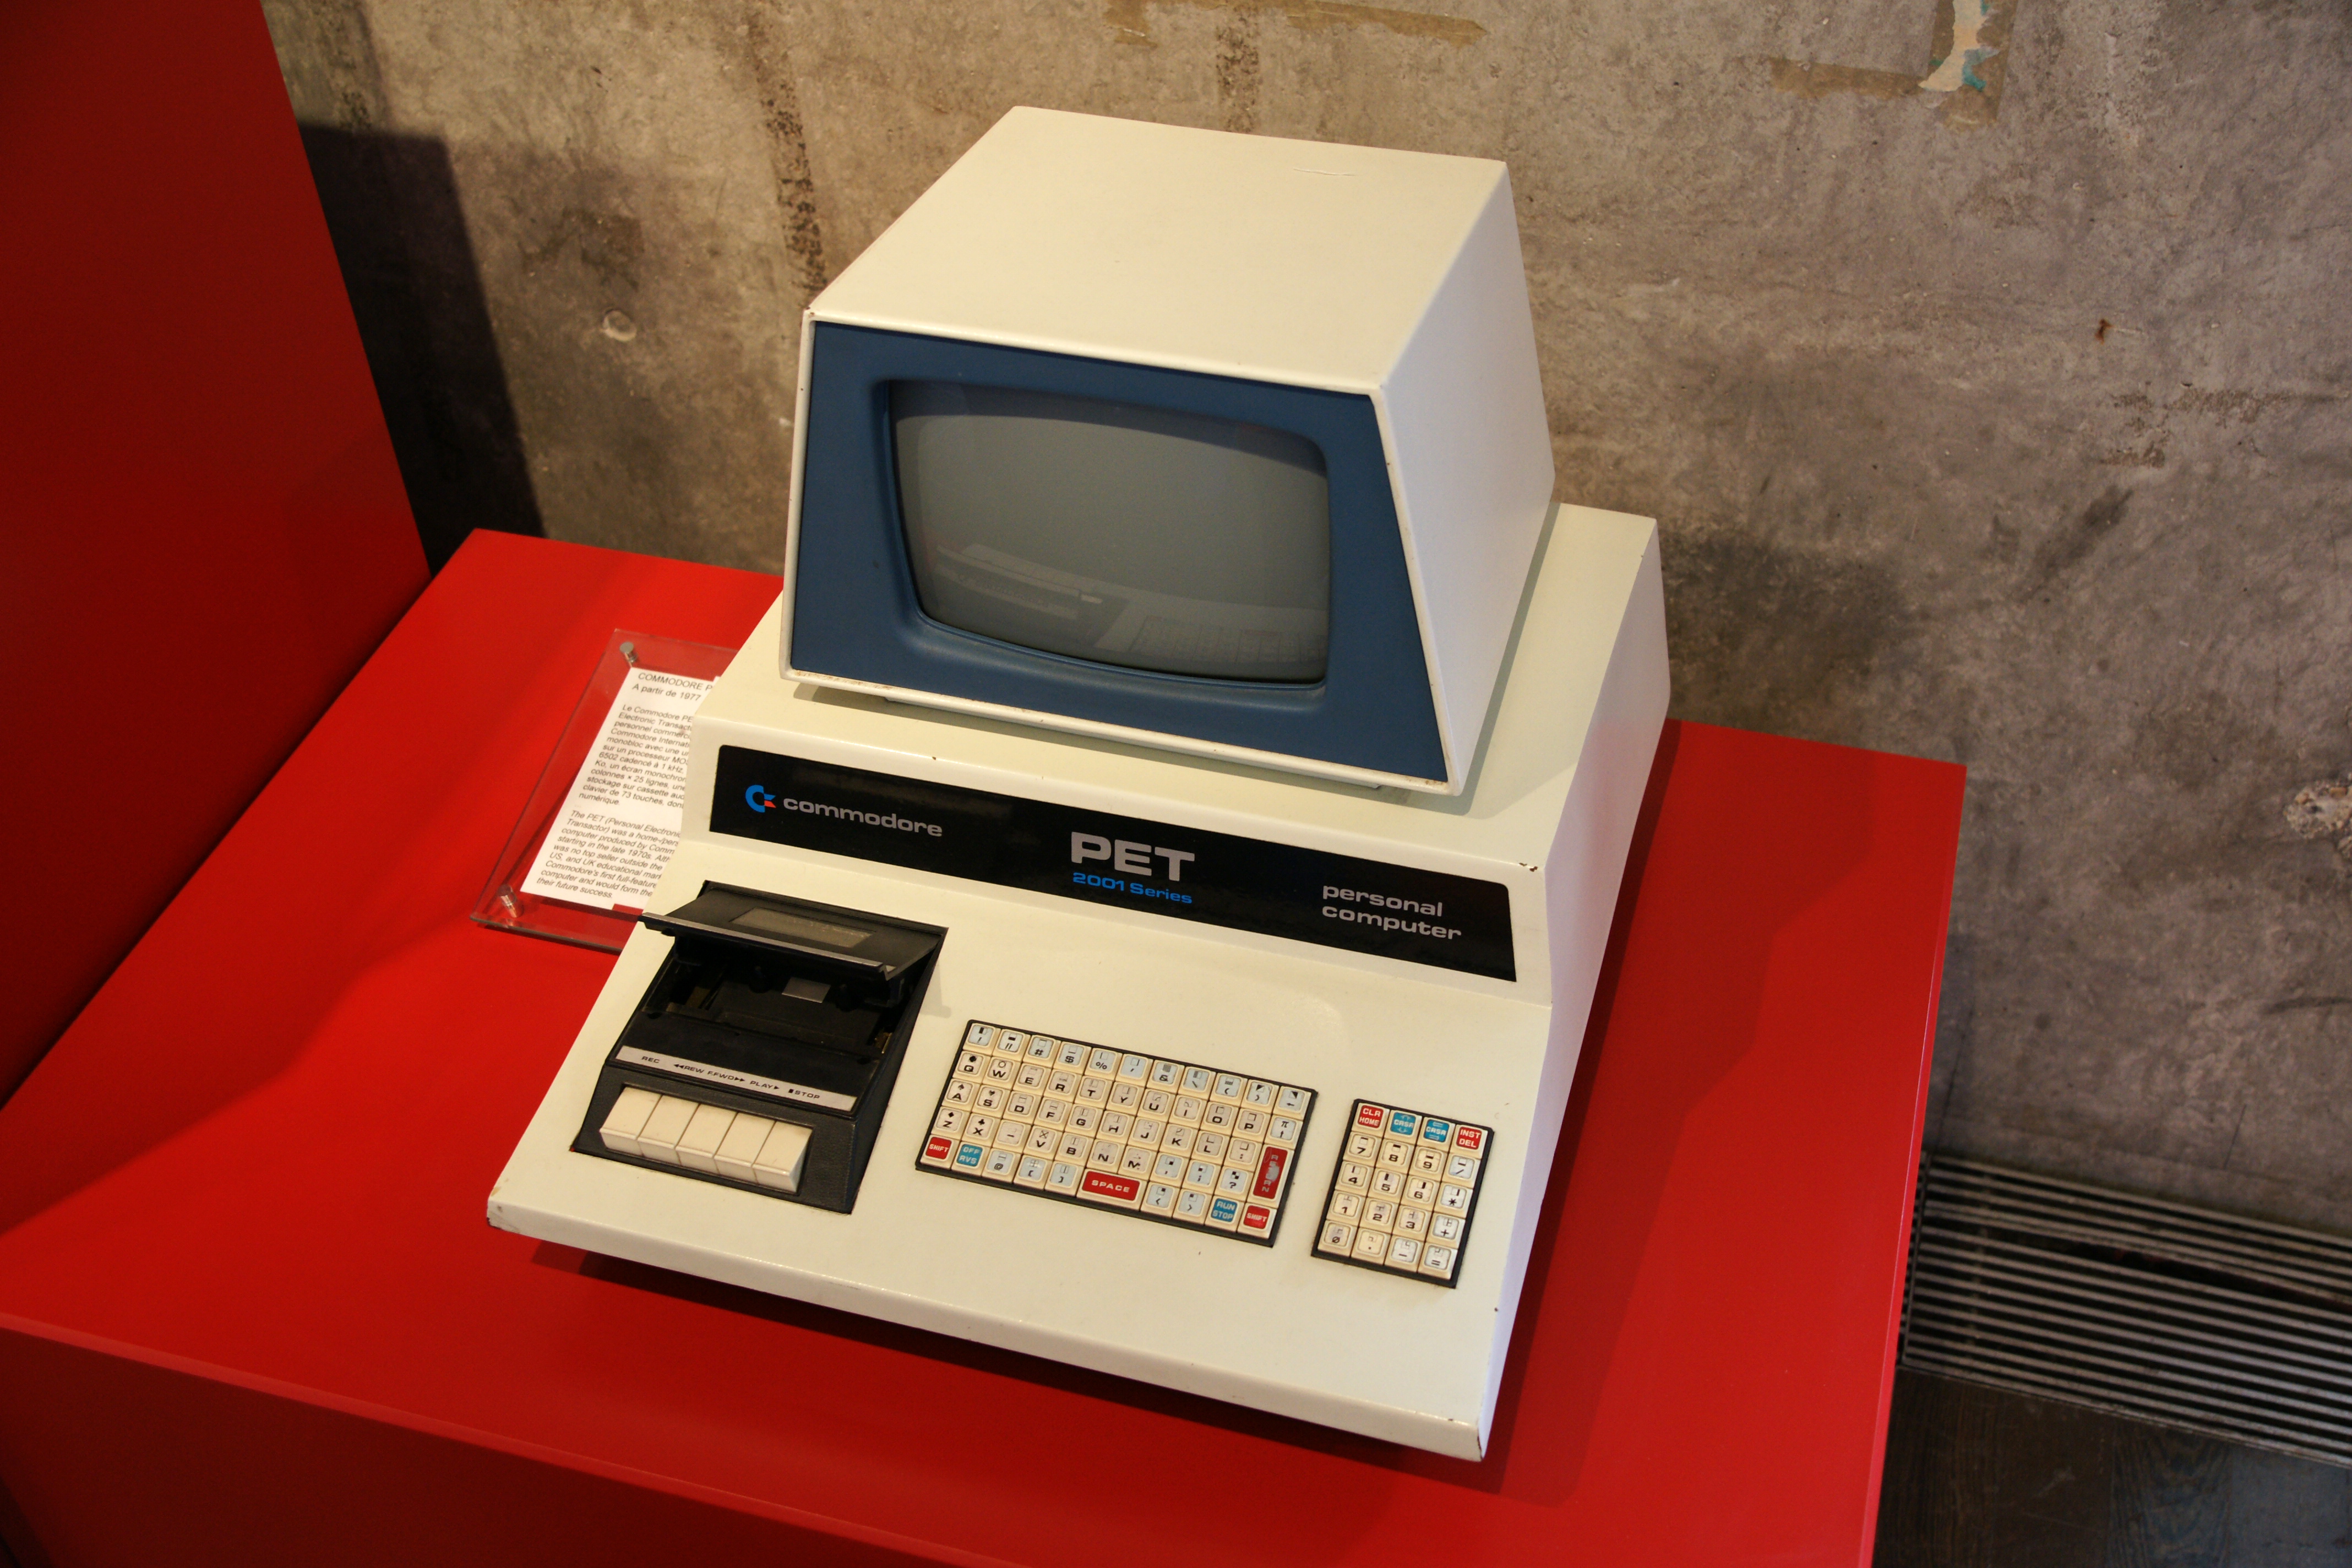 File:Commodore PET 2001.jpg - Wikimedia Commons